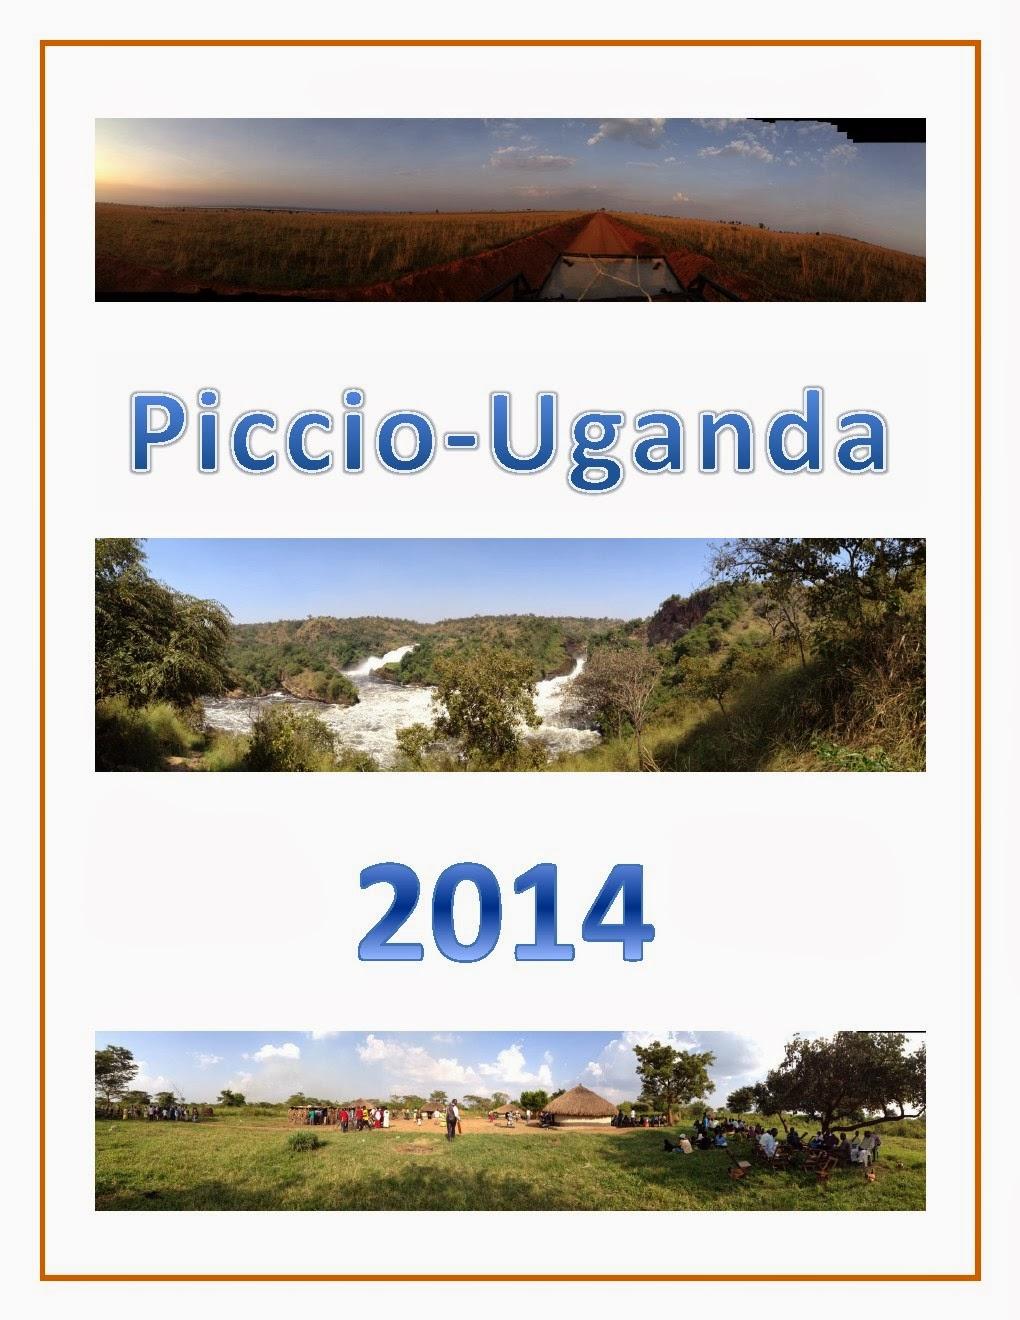 Calendario Piccio-Uganda 2014